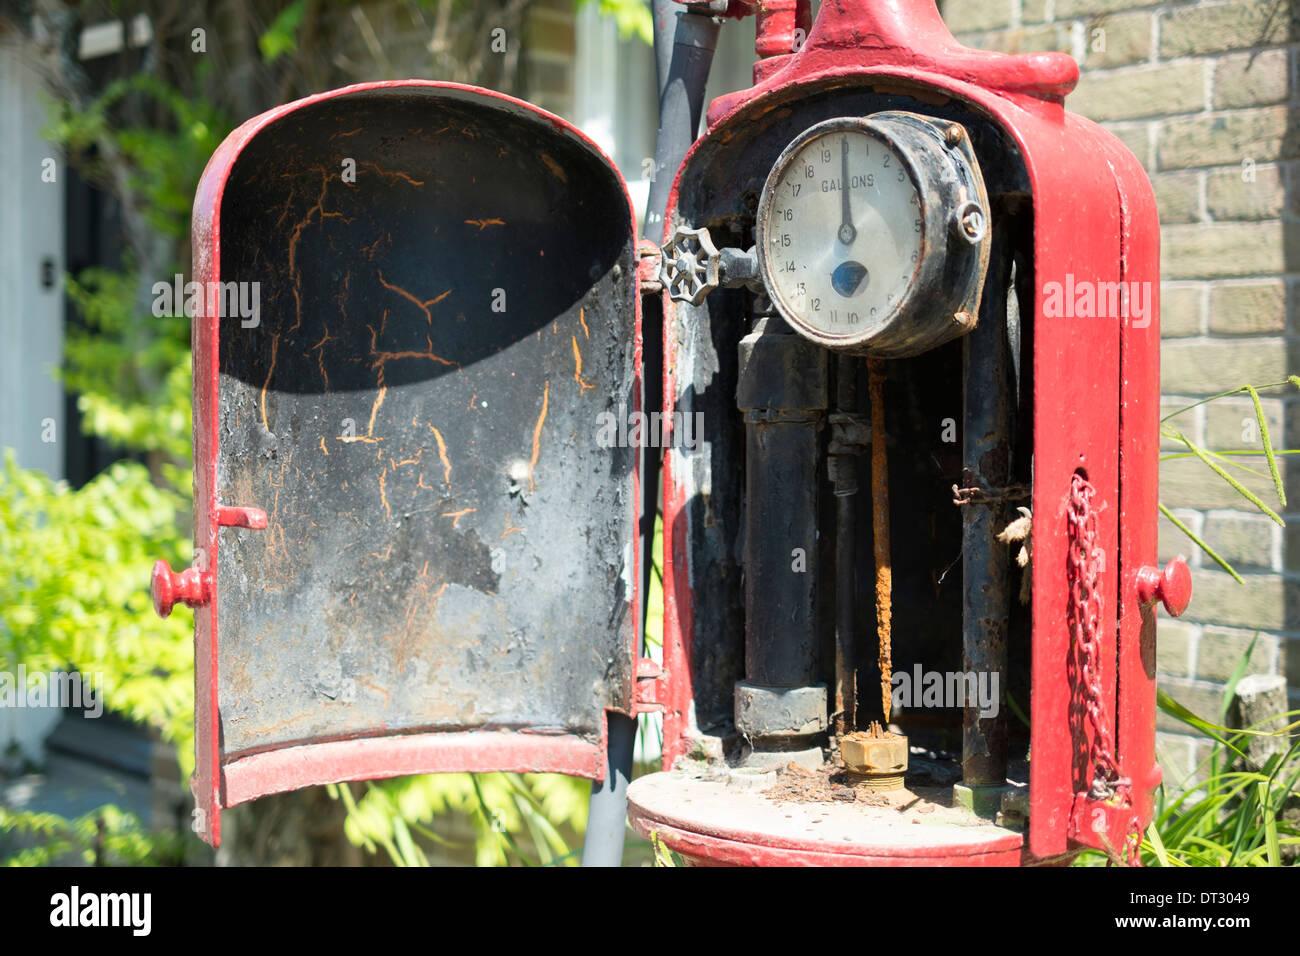 Old Petrol Pump, Dorset - Stock Image